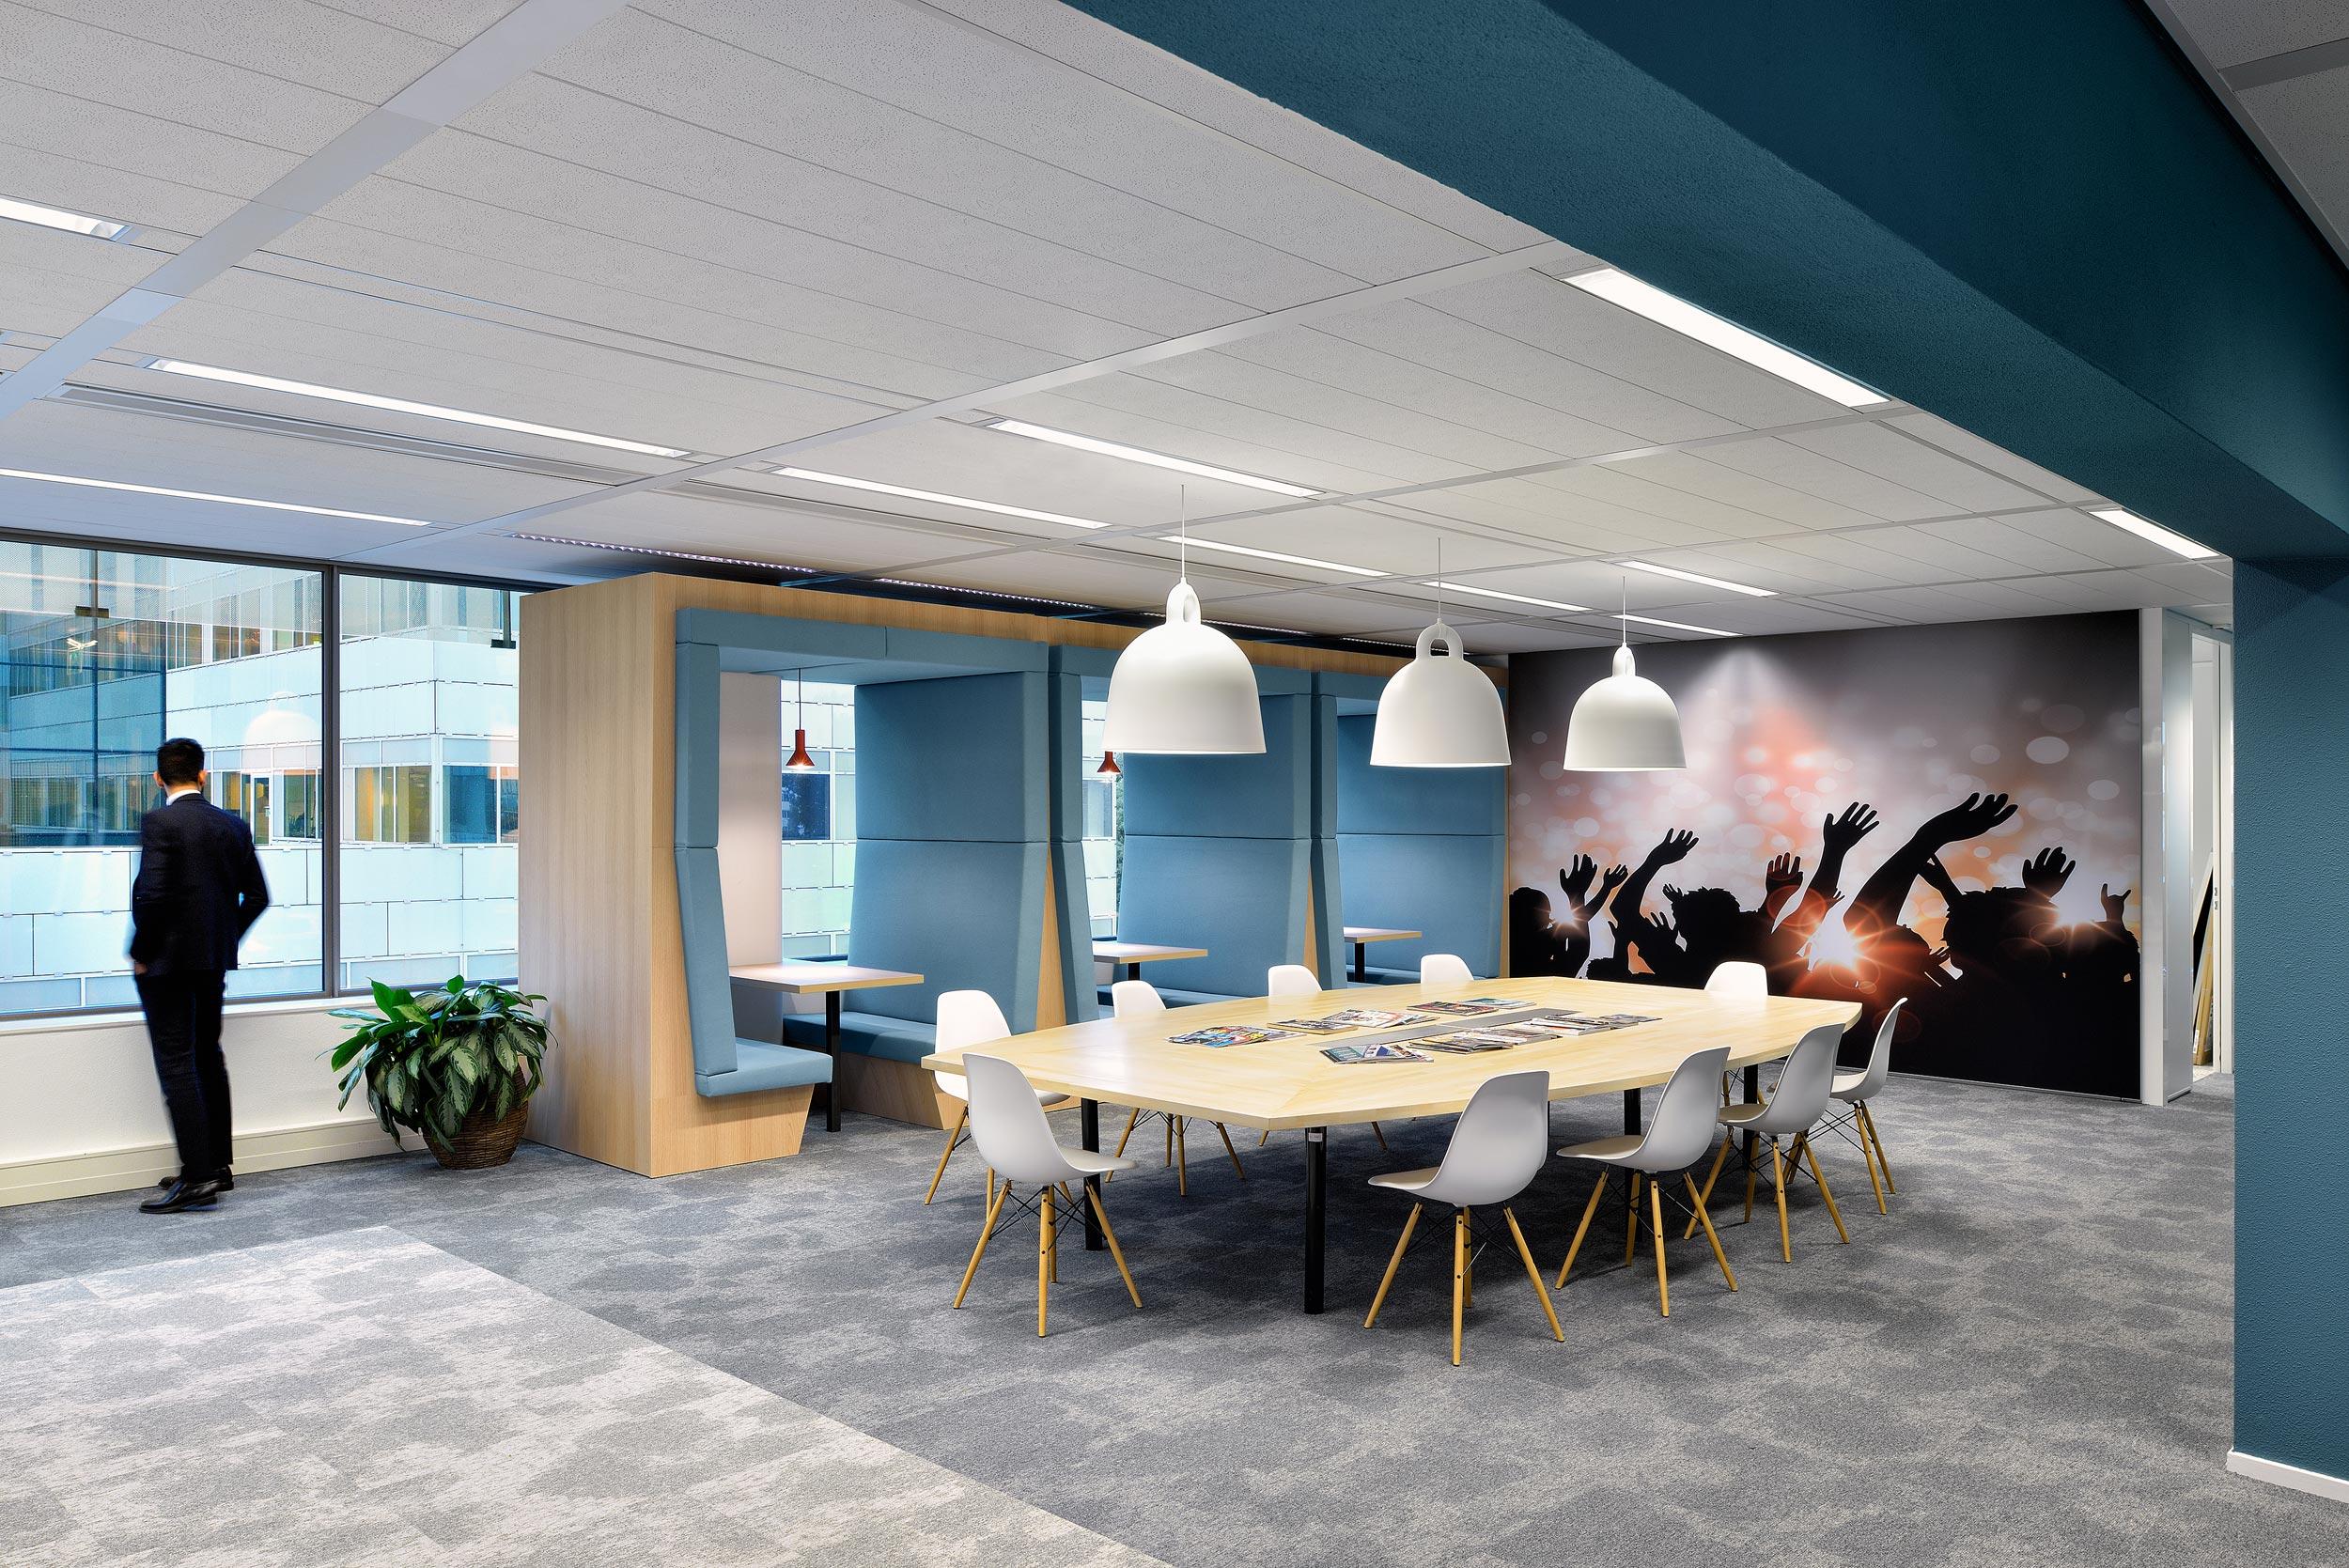 Interieur Harman Kardon kantoorgebouw Apollo Amsterdam - interieurfotograaf Chiel de Nooyer